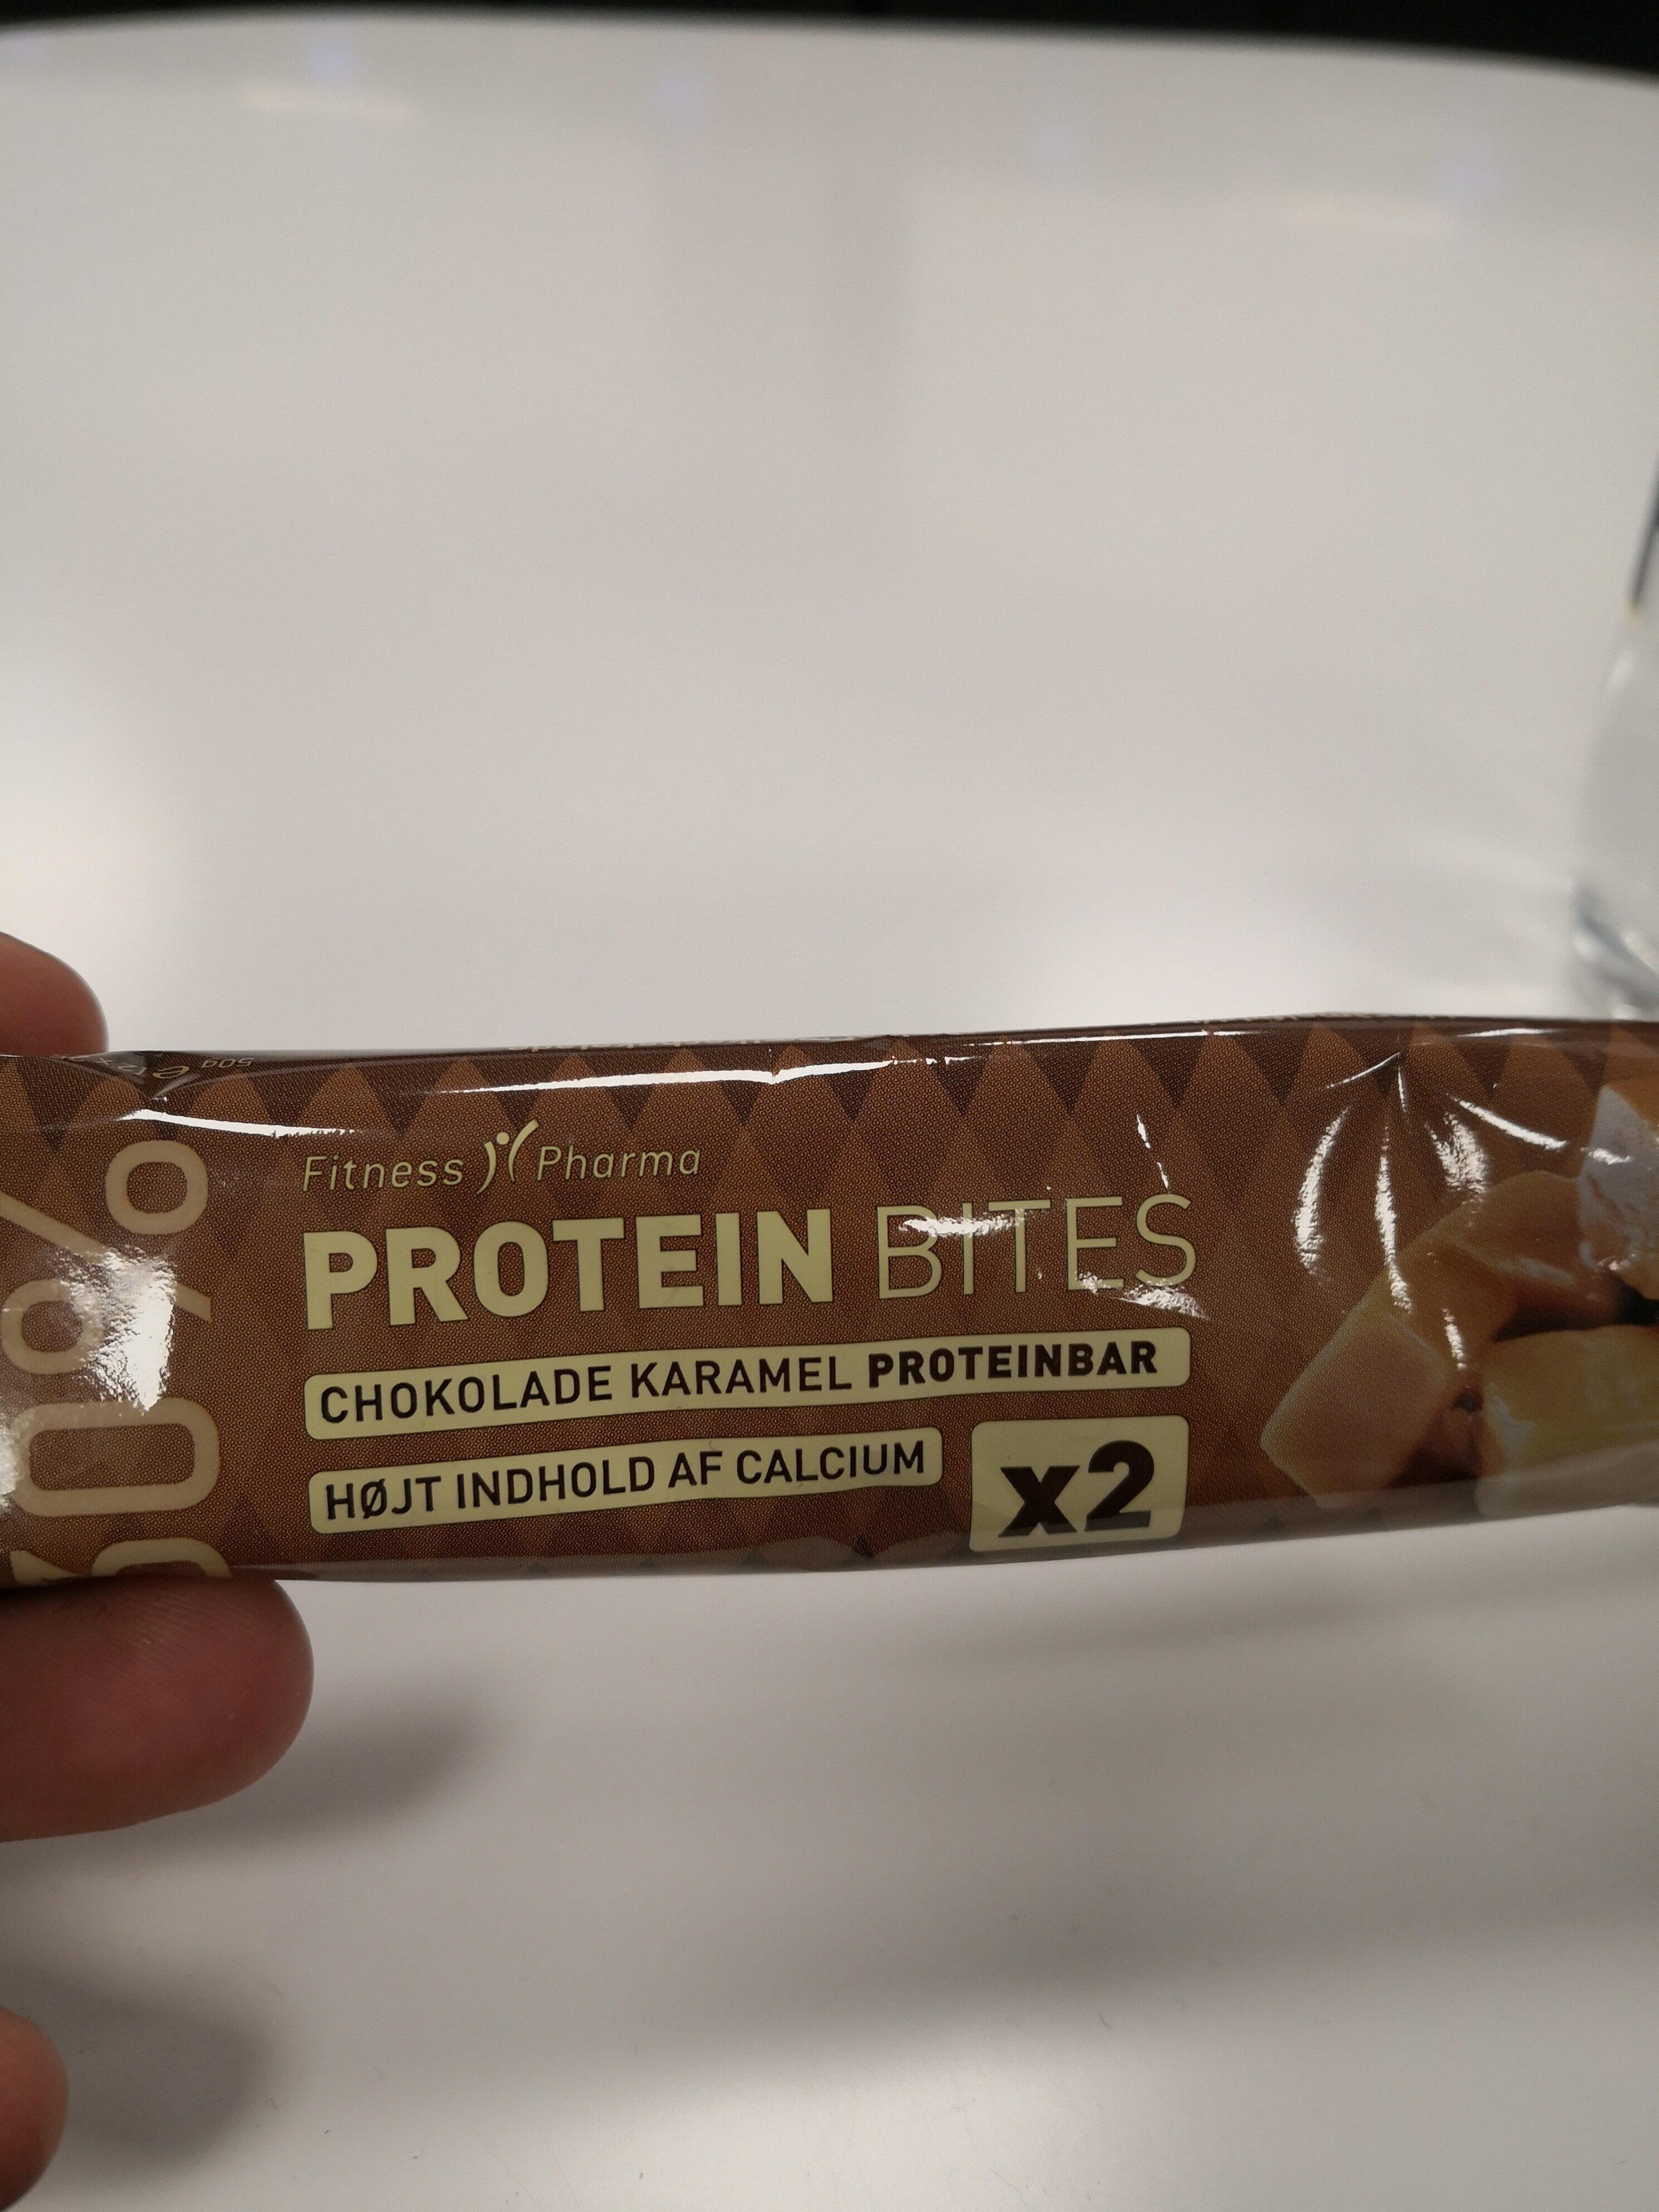 fitness pharma protein bites karamel - Produit - da